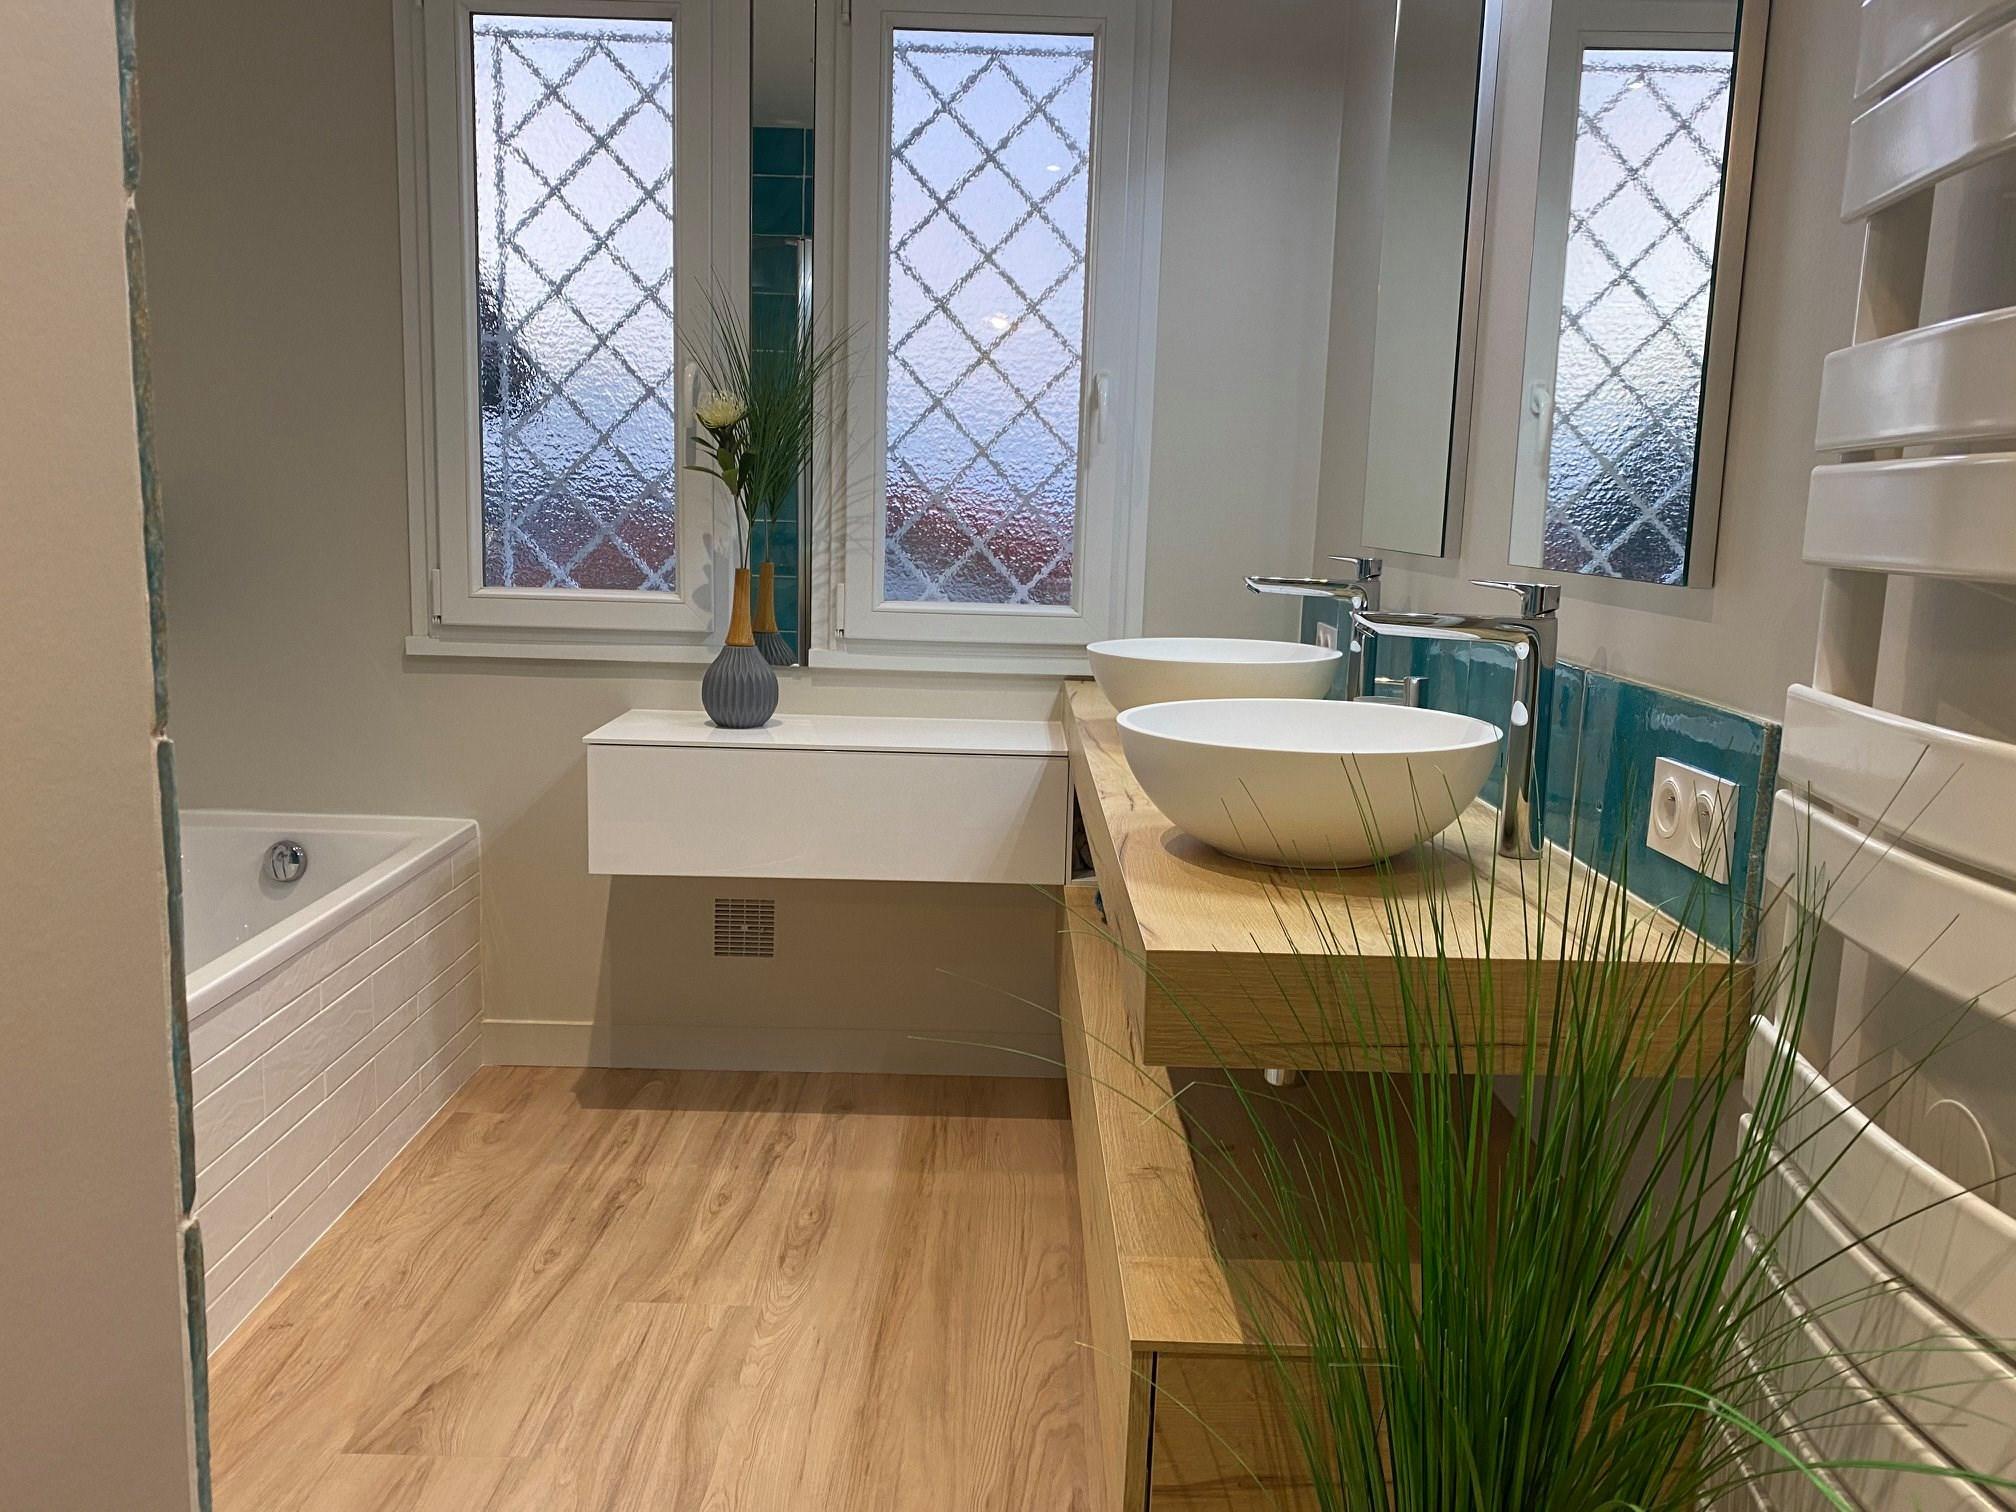 salle bain boheme chic vasque baignoire